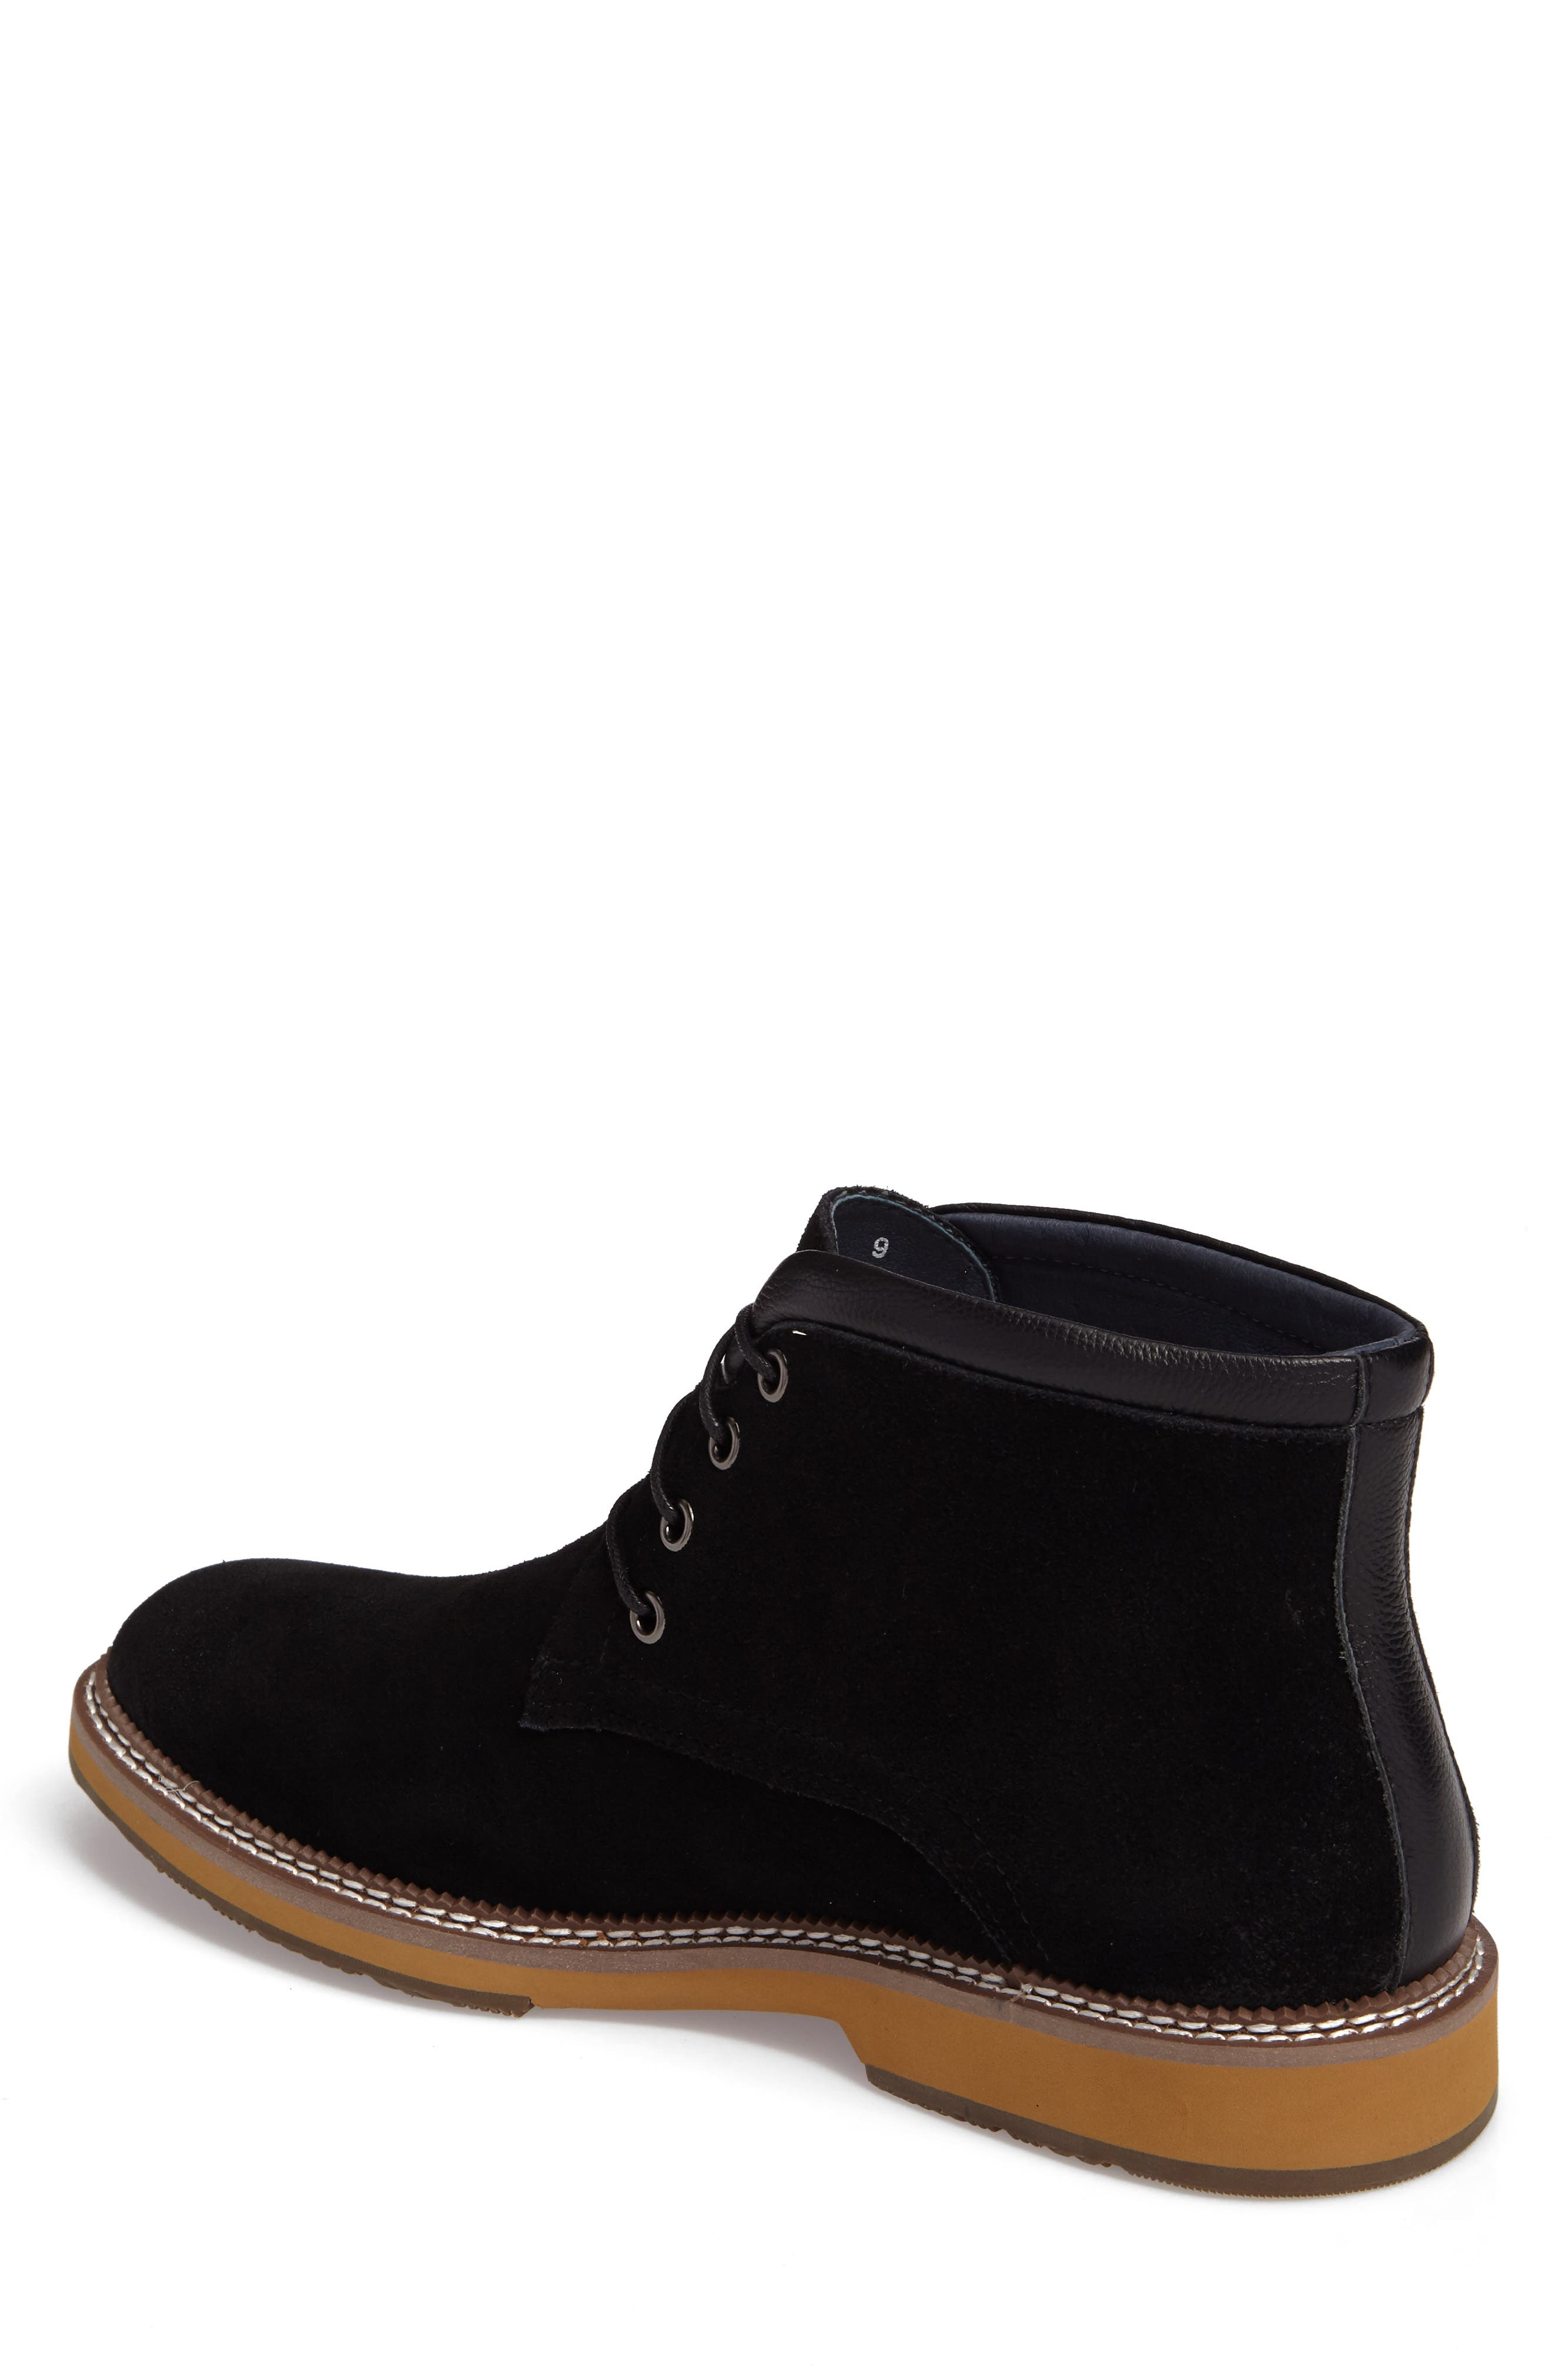 Lazo Chukka Boot,                             Alternate thumbnail 2, color,                             Black Leather